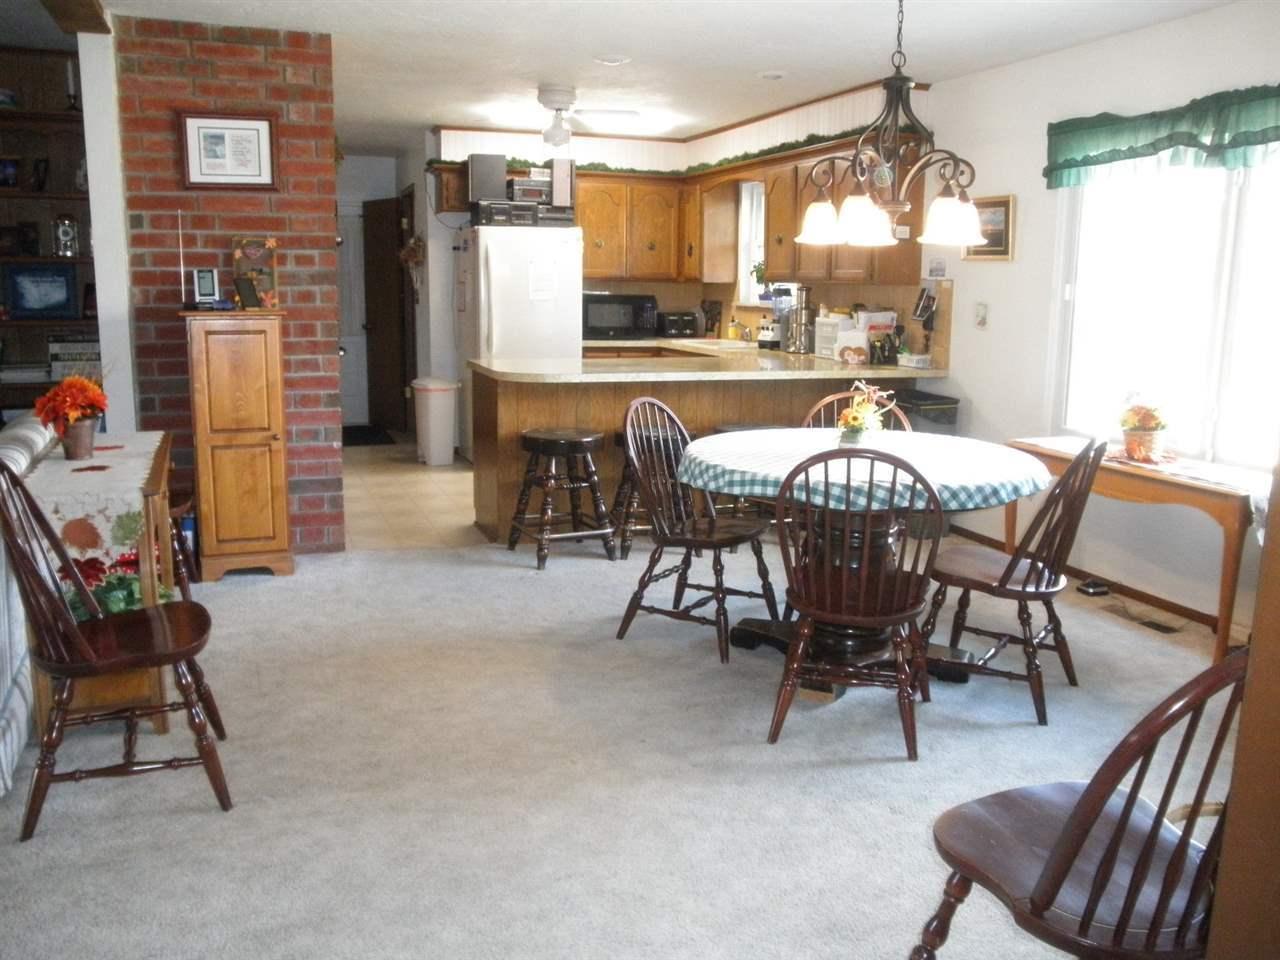 Sold Cross Sale W/ MLS | 1275 S Enterprise Road  Ponca City, OK 74604 8